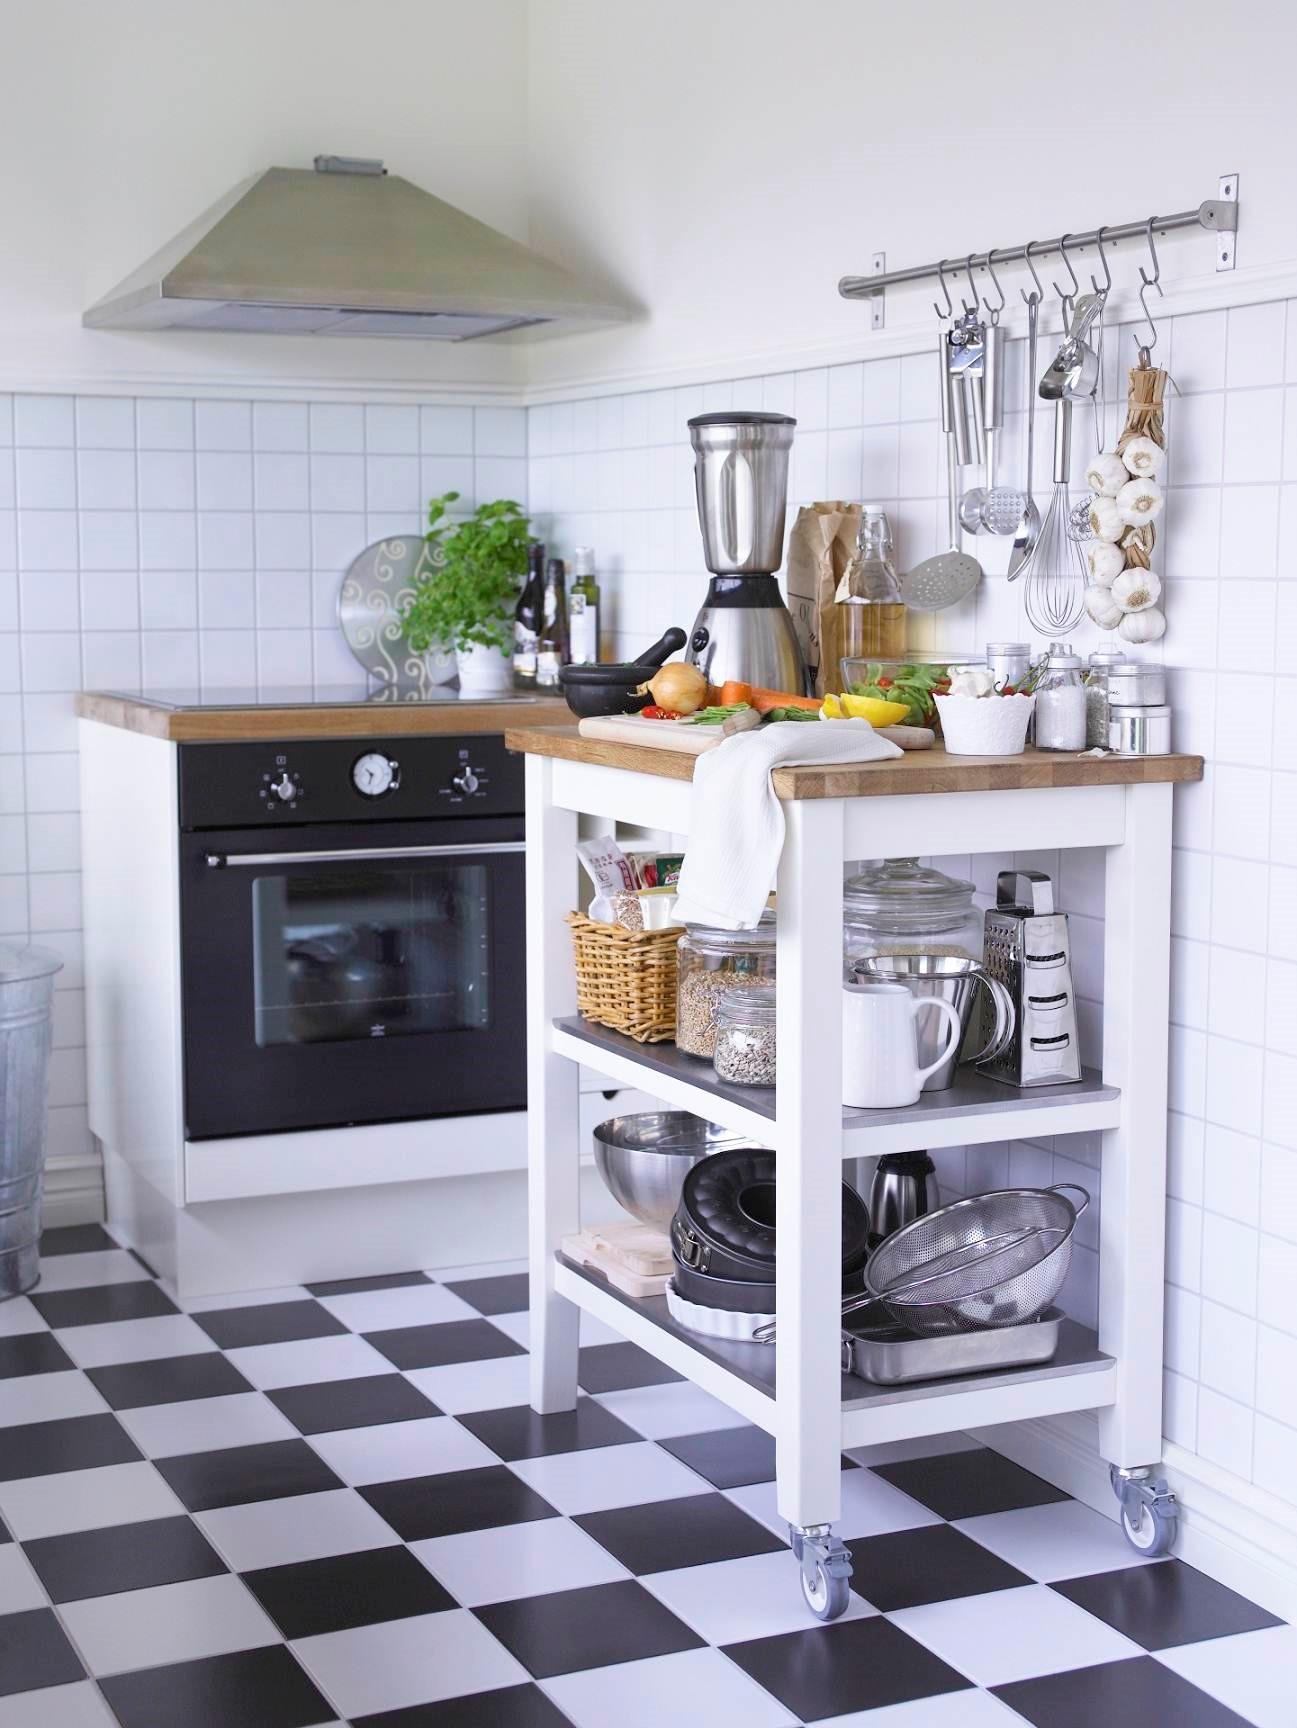 ikea kitchen countertops small commercial cost 絕版品出清 精選商品全面5 折起 設計家searchome stenstorp白色橡木廚房推車可提供額外儲物空間及工作檯面